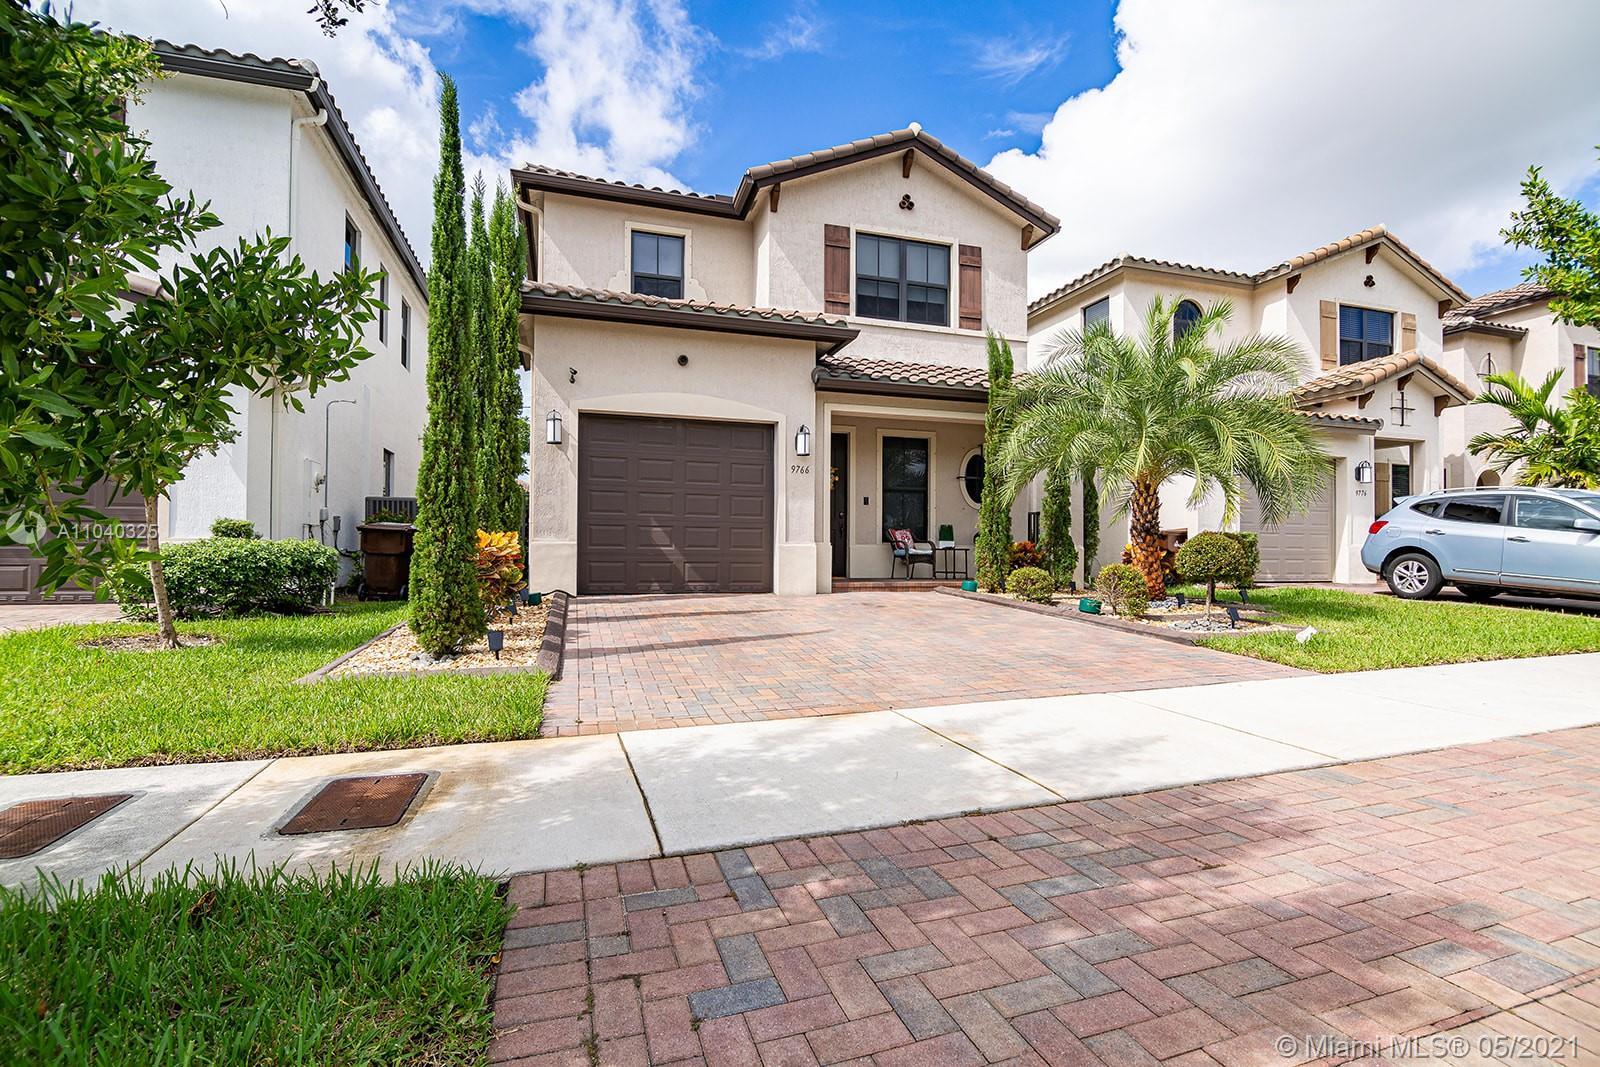 Bonterra - 9766 W 34th Ave, Hialeah, FL 33018